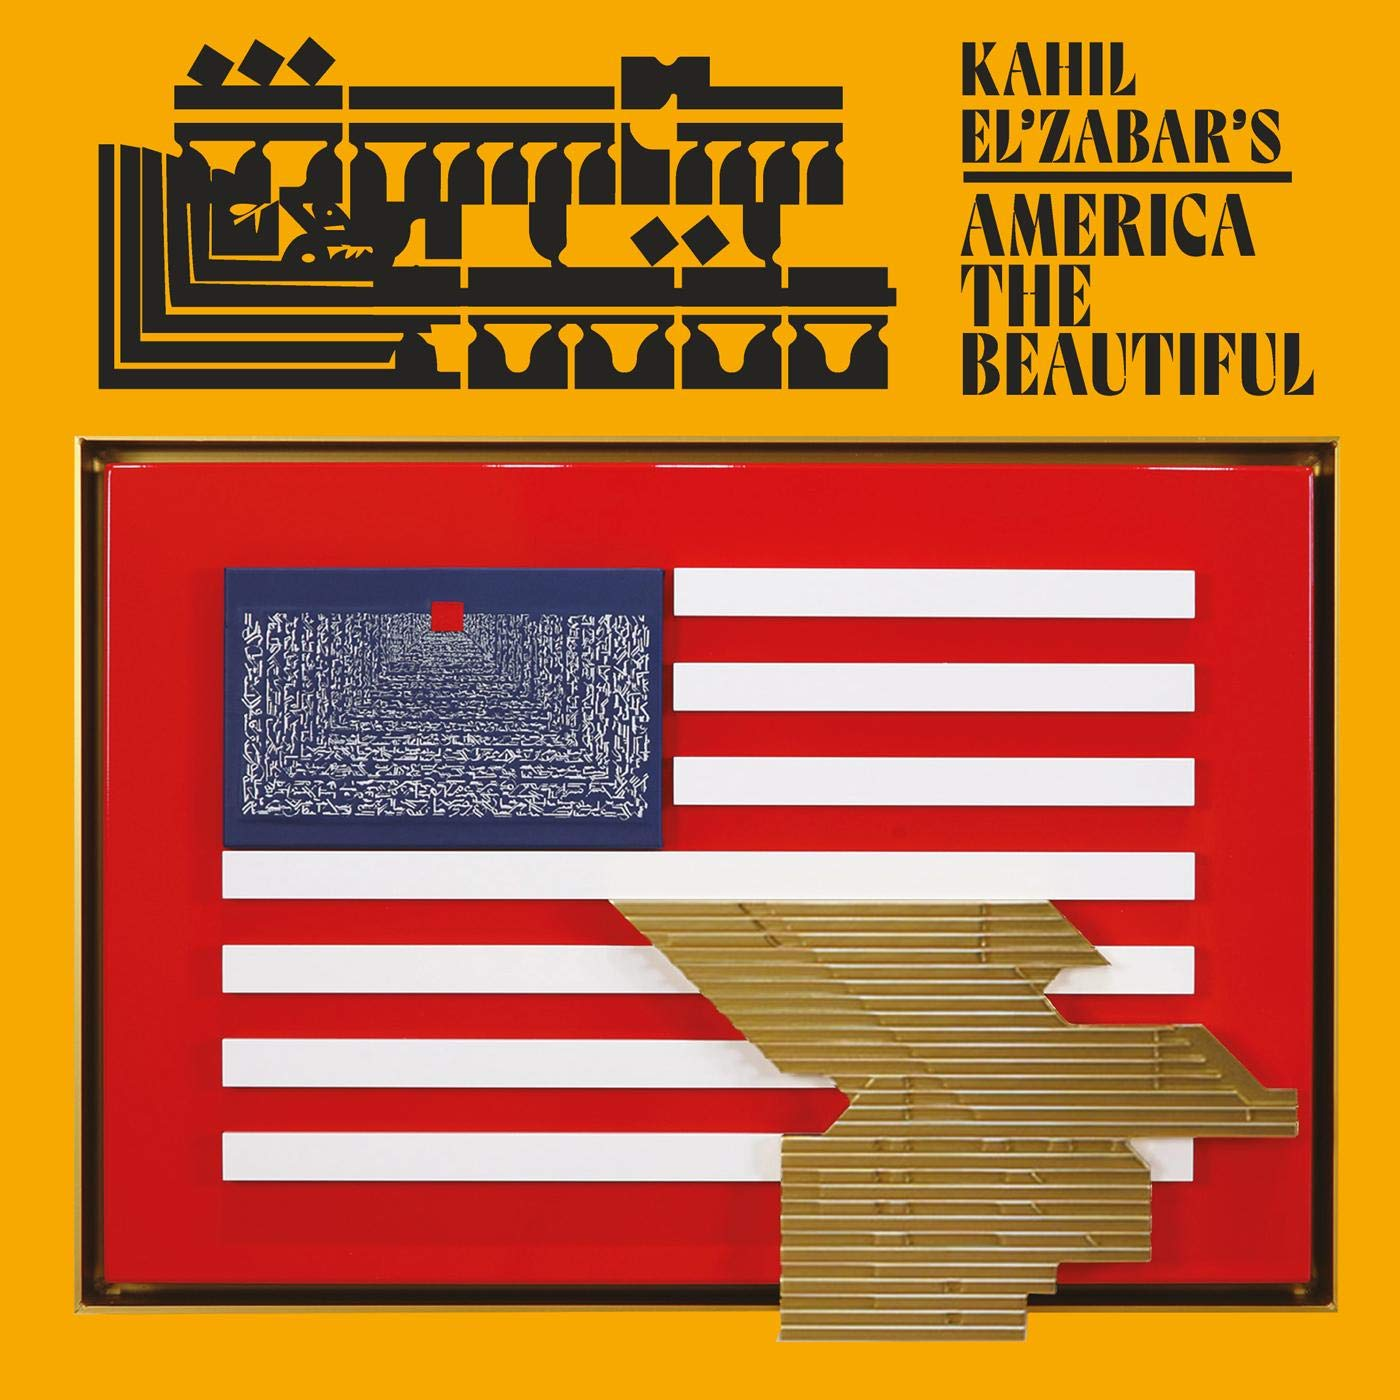 KAHIL ELZABAR - Kahil ElZabars America The Beautiful cover